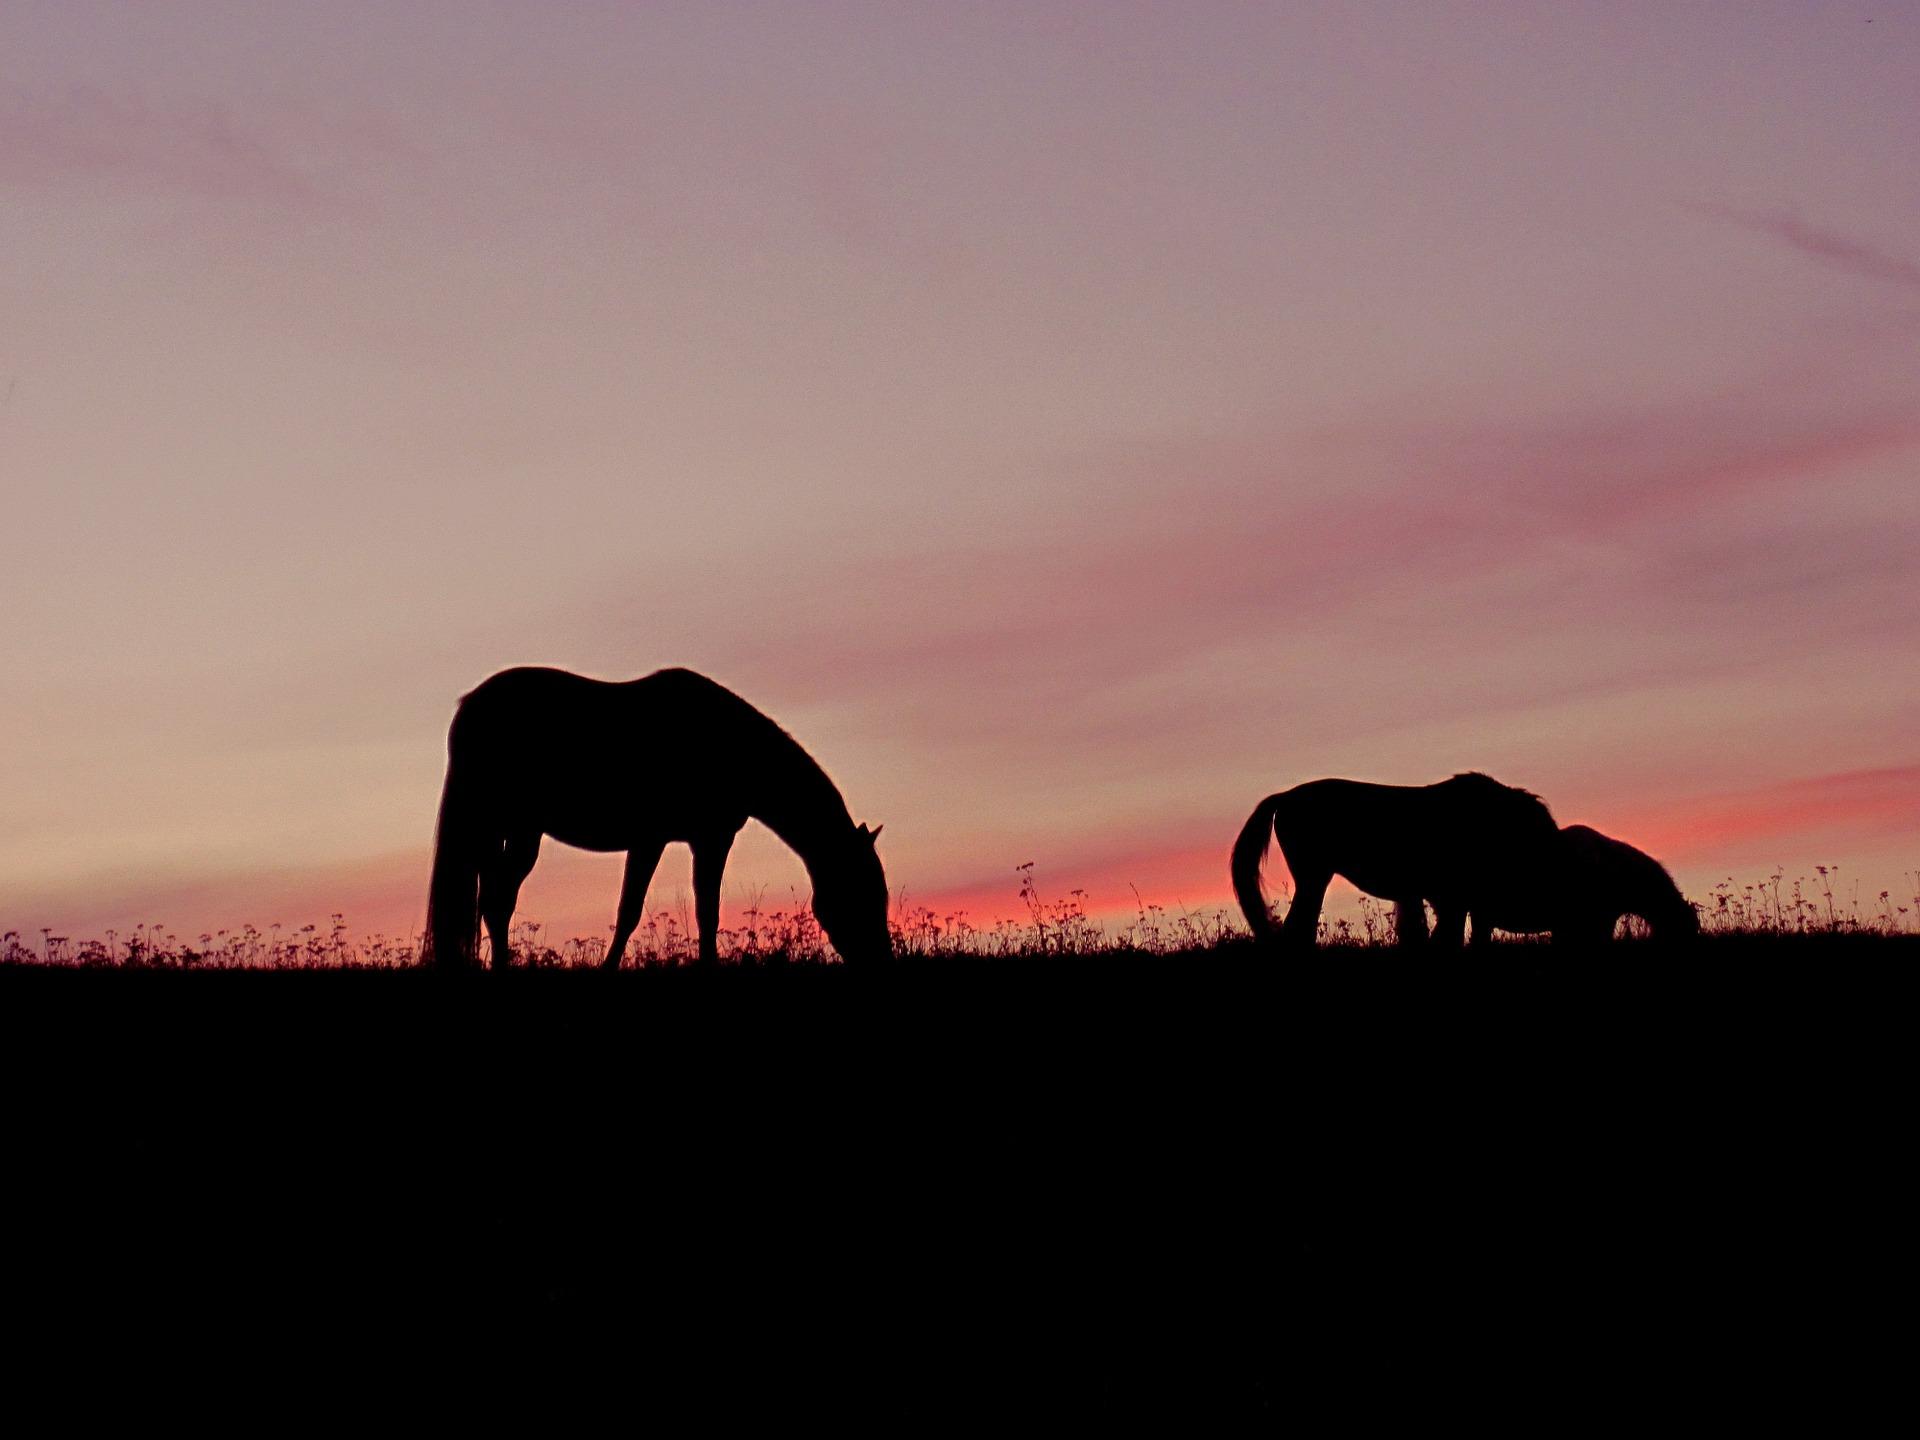 horses-921975_1920